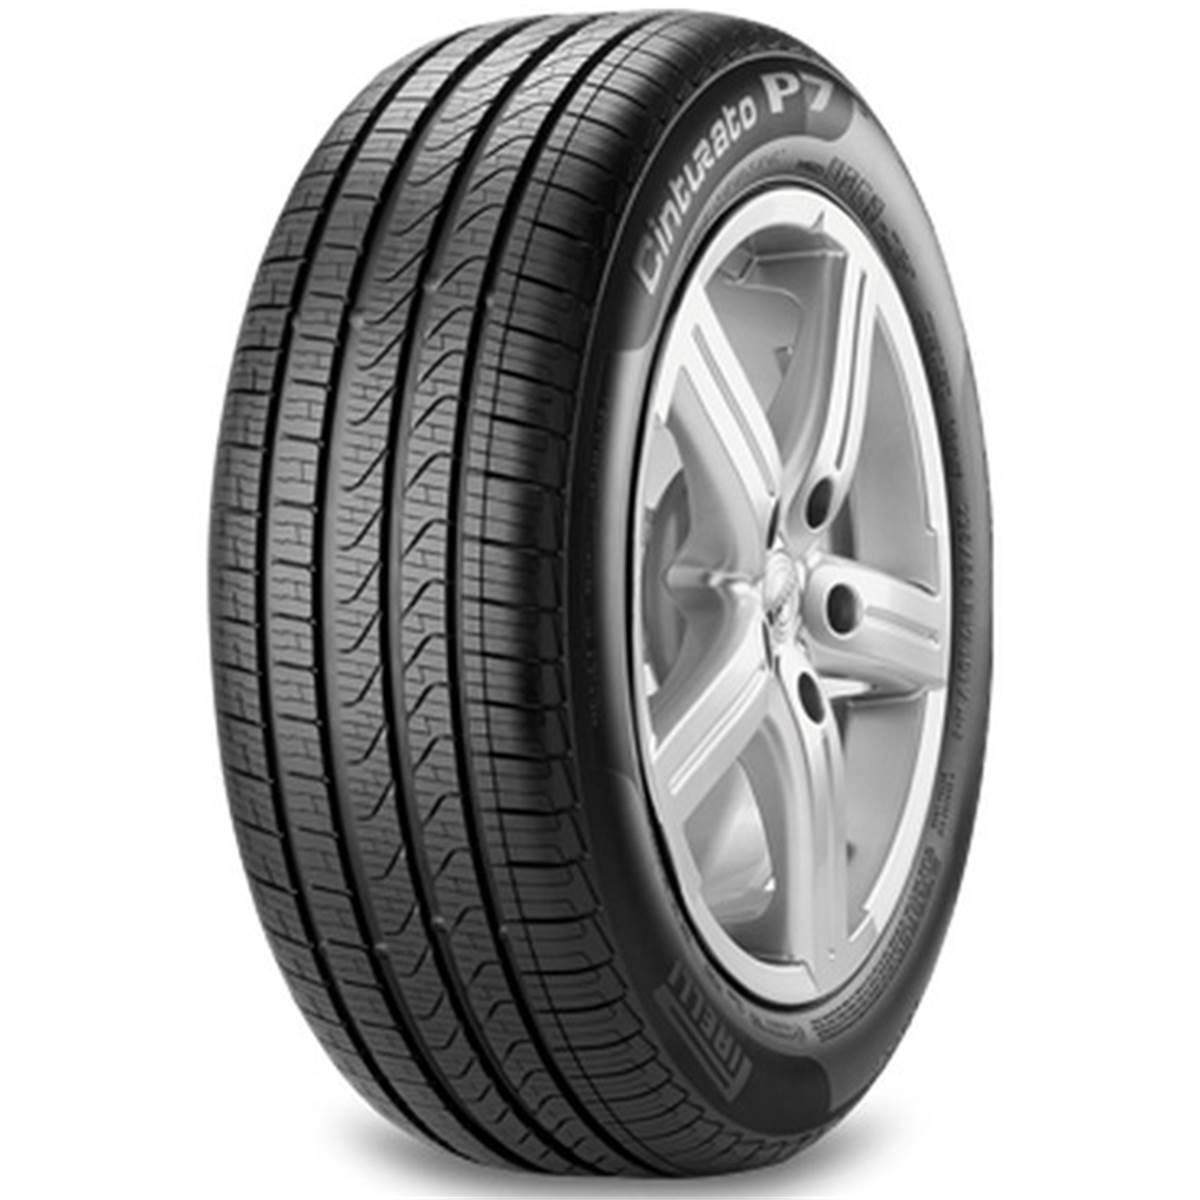 Pirelli Cinturato P7 All Season XL